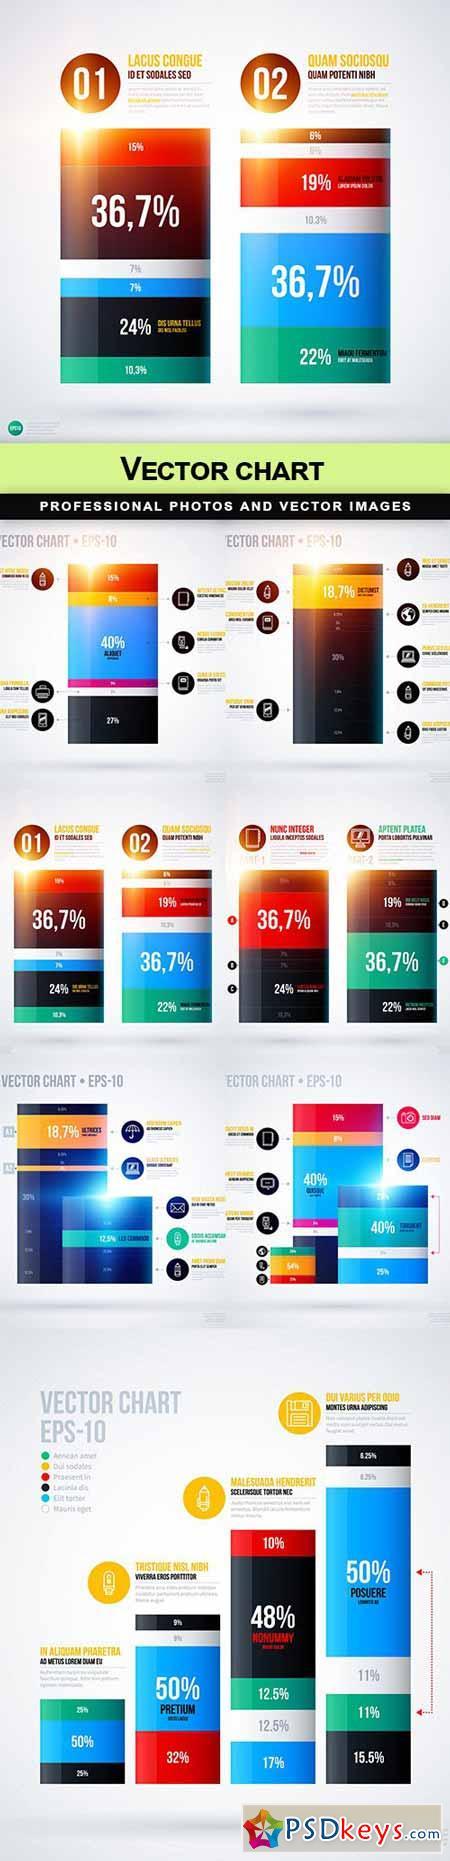 Vector chart - 7 EPS